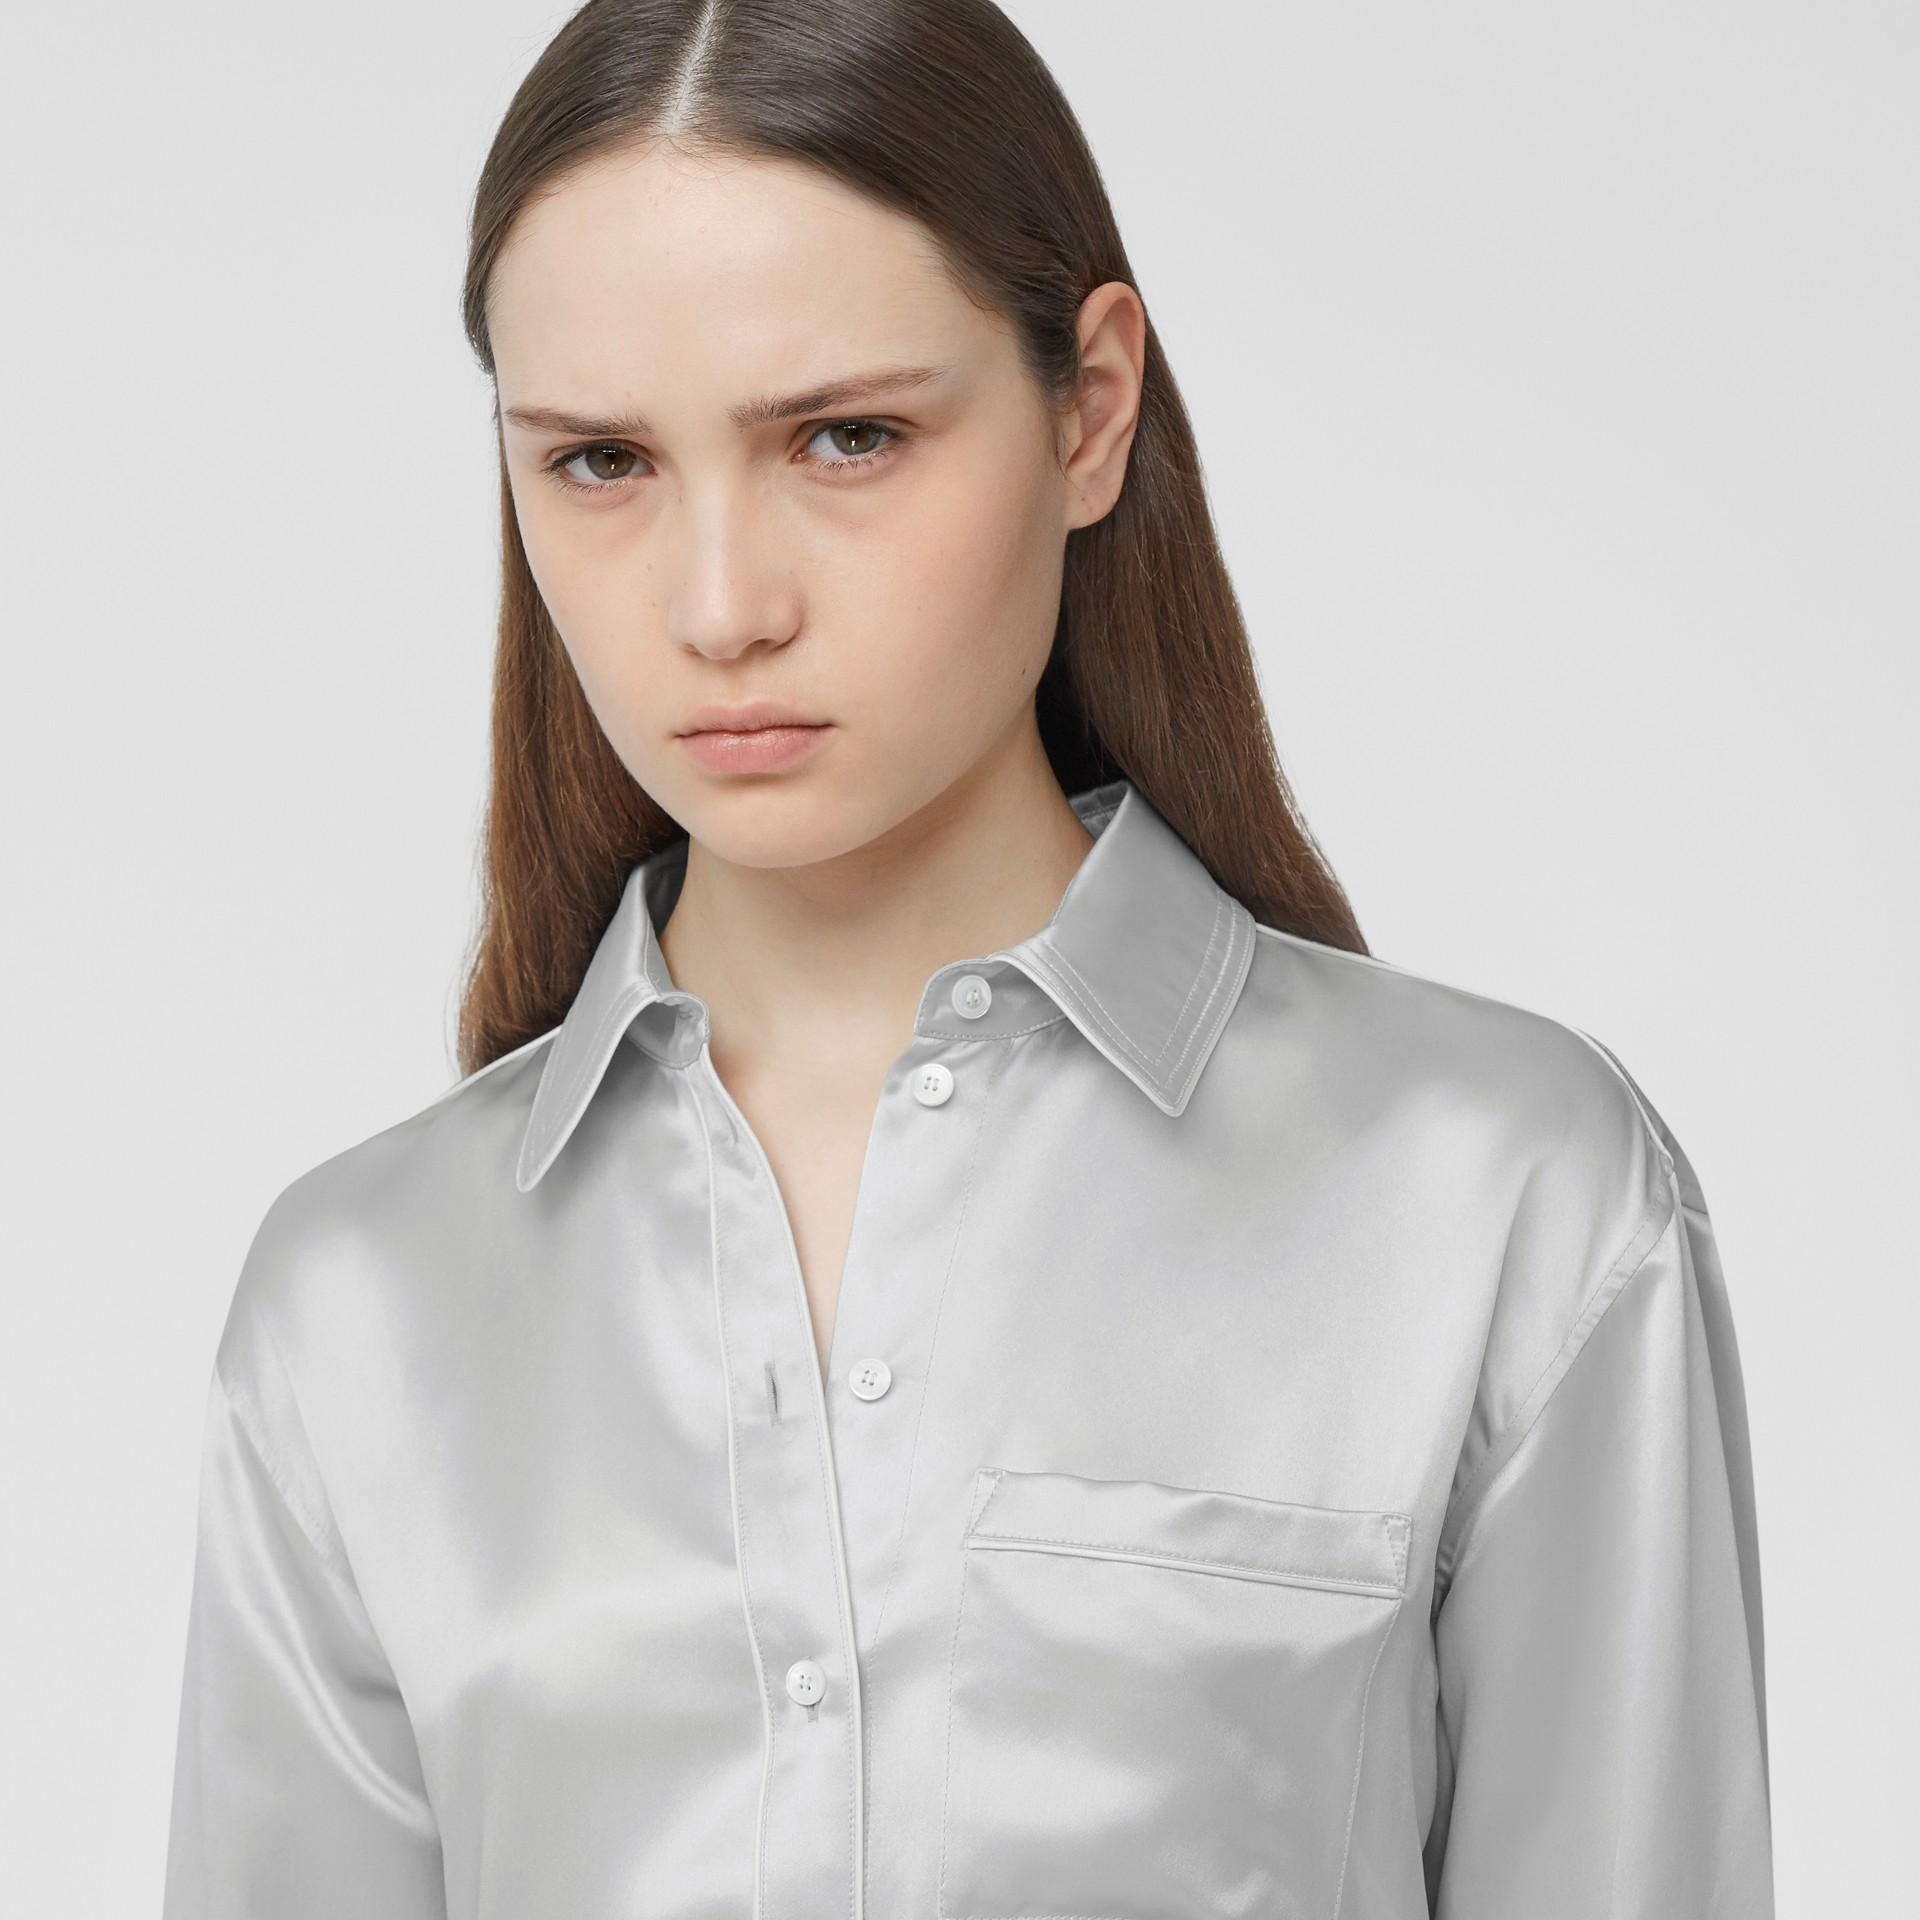 Silk Satin Shirt in Light Pebble Grey - Women | Burberry - gallery image 1